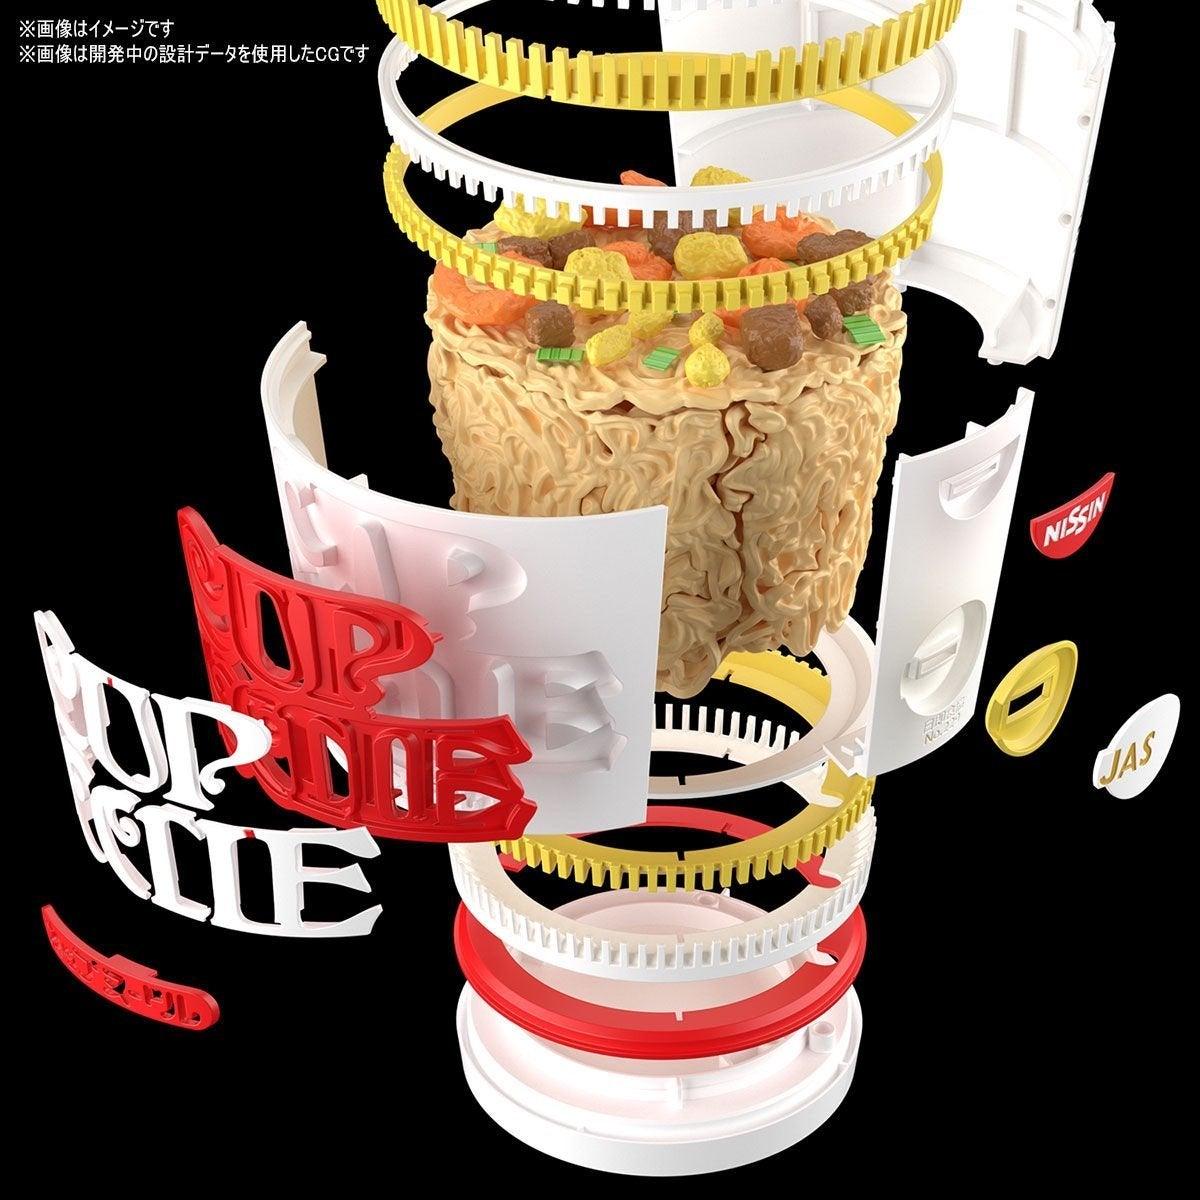 cup-noodle-model-bandai